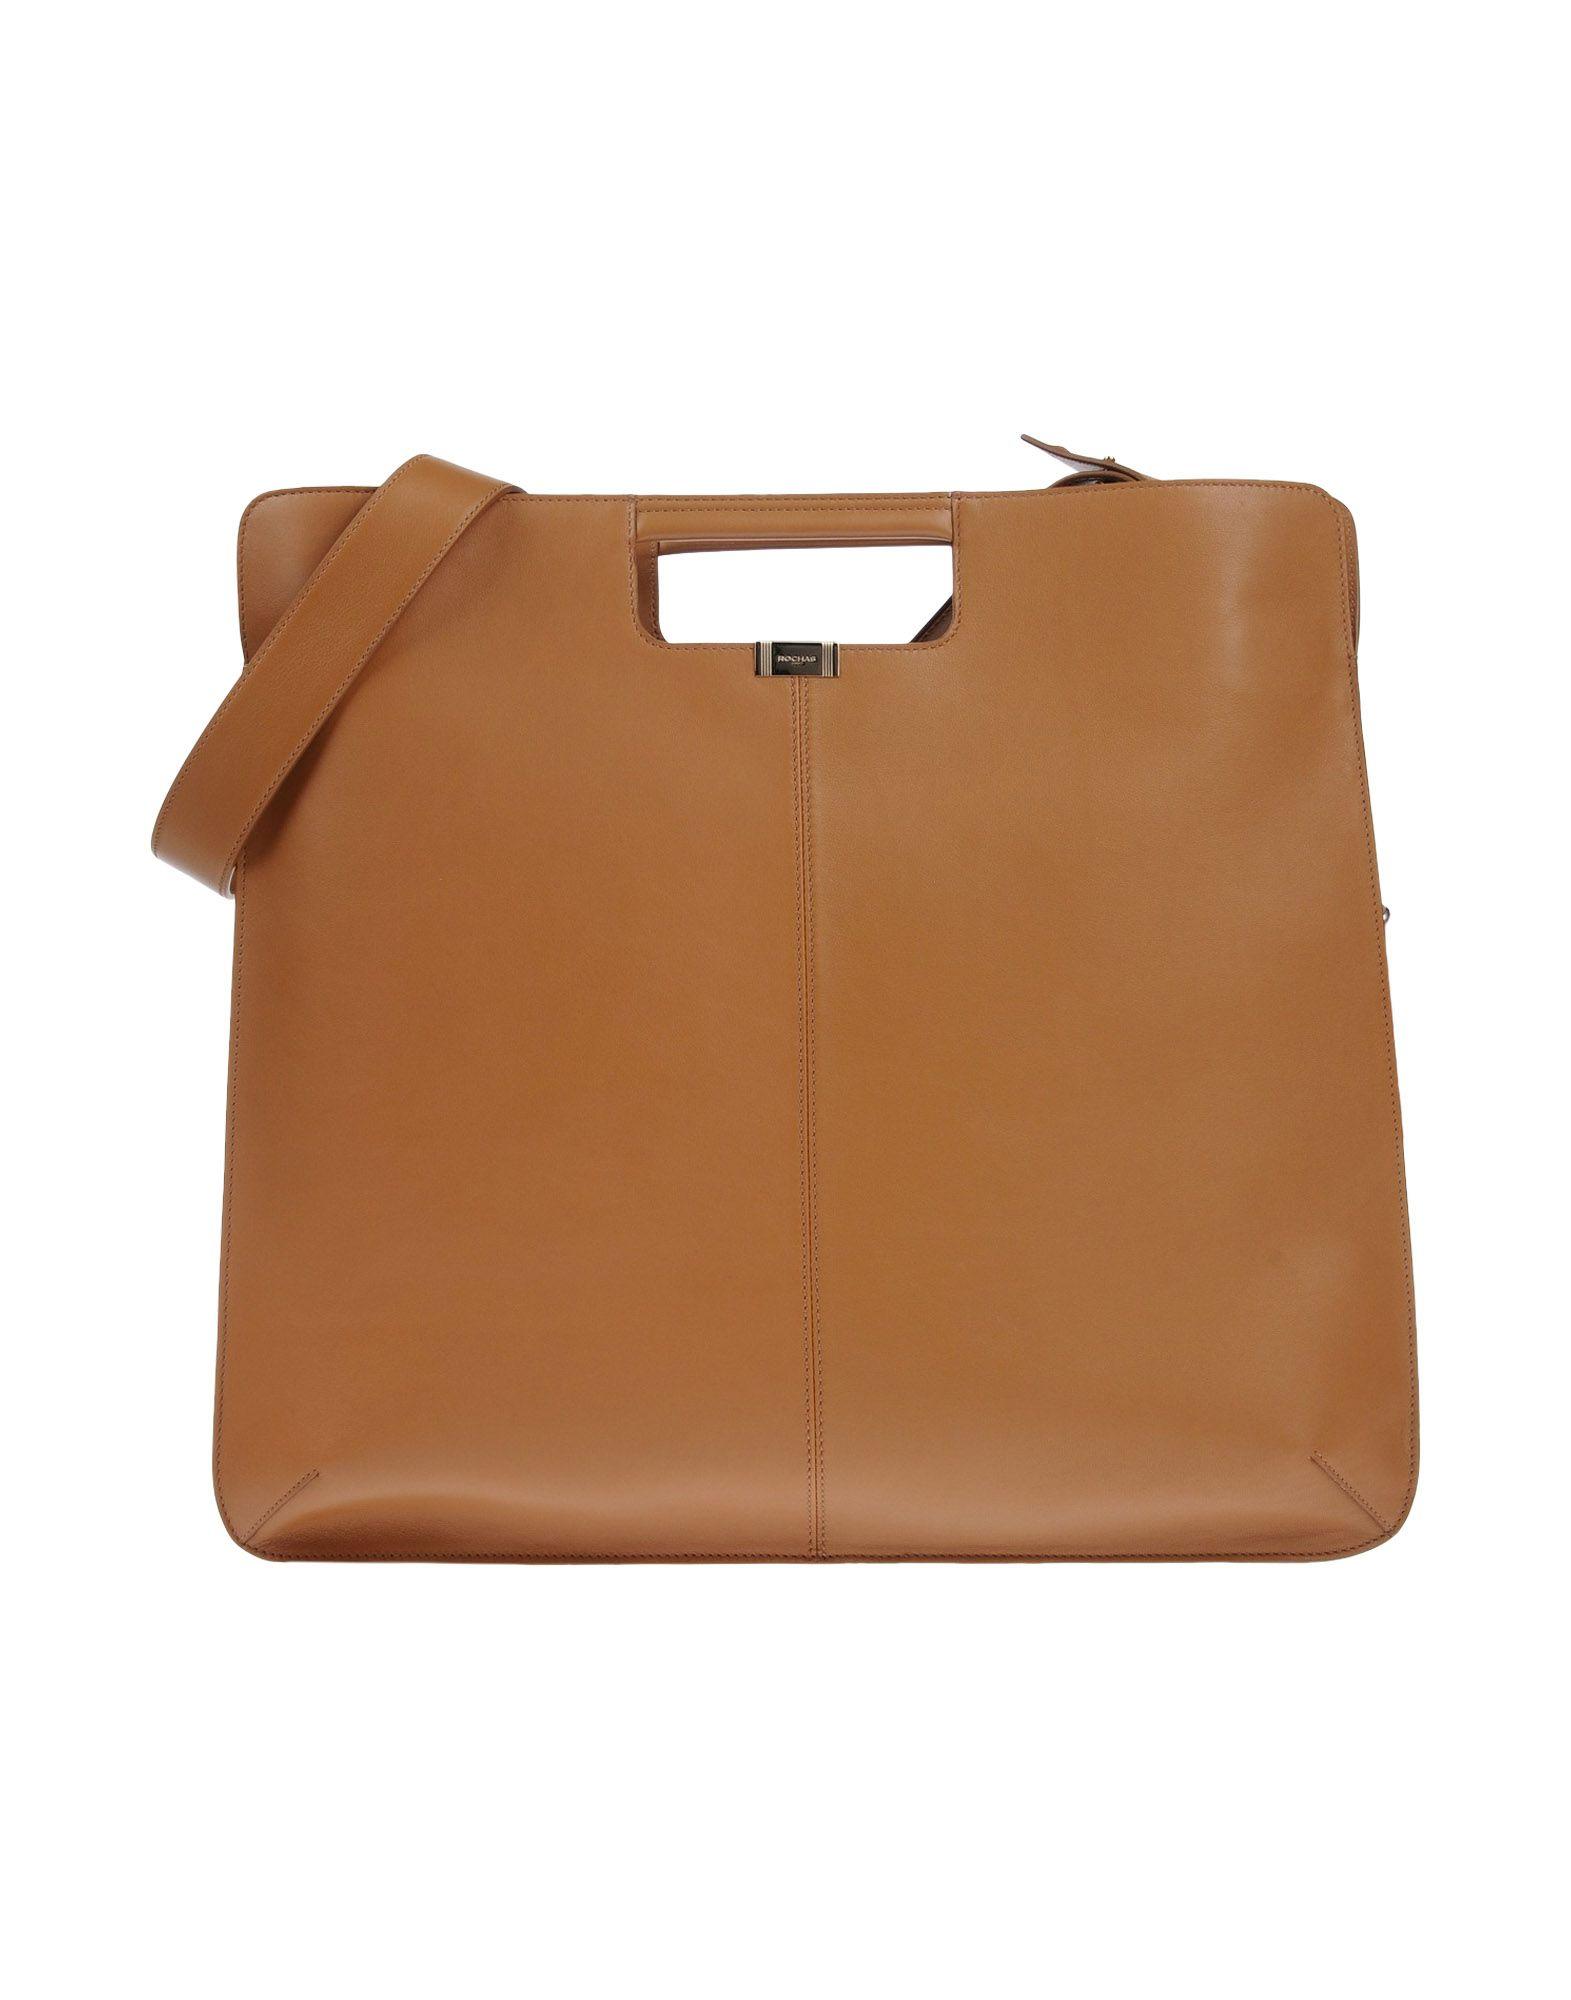 2aad0aed4a Rochas Handbag - Women Rochas Handbags online on YOOX Lithuania - 45405171BK